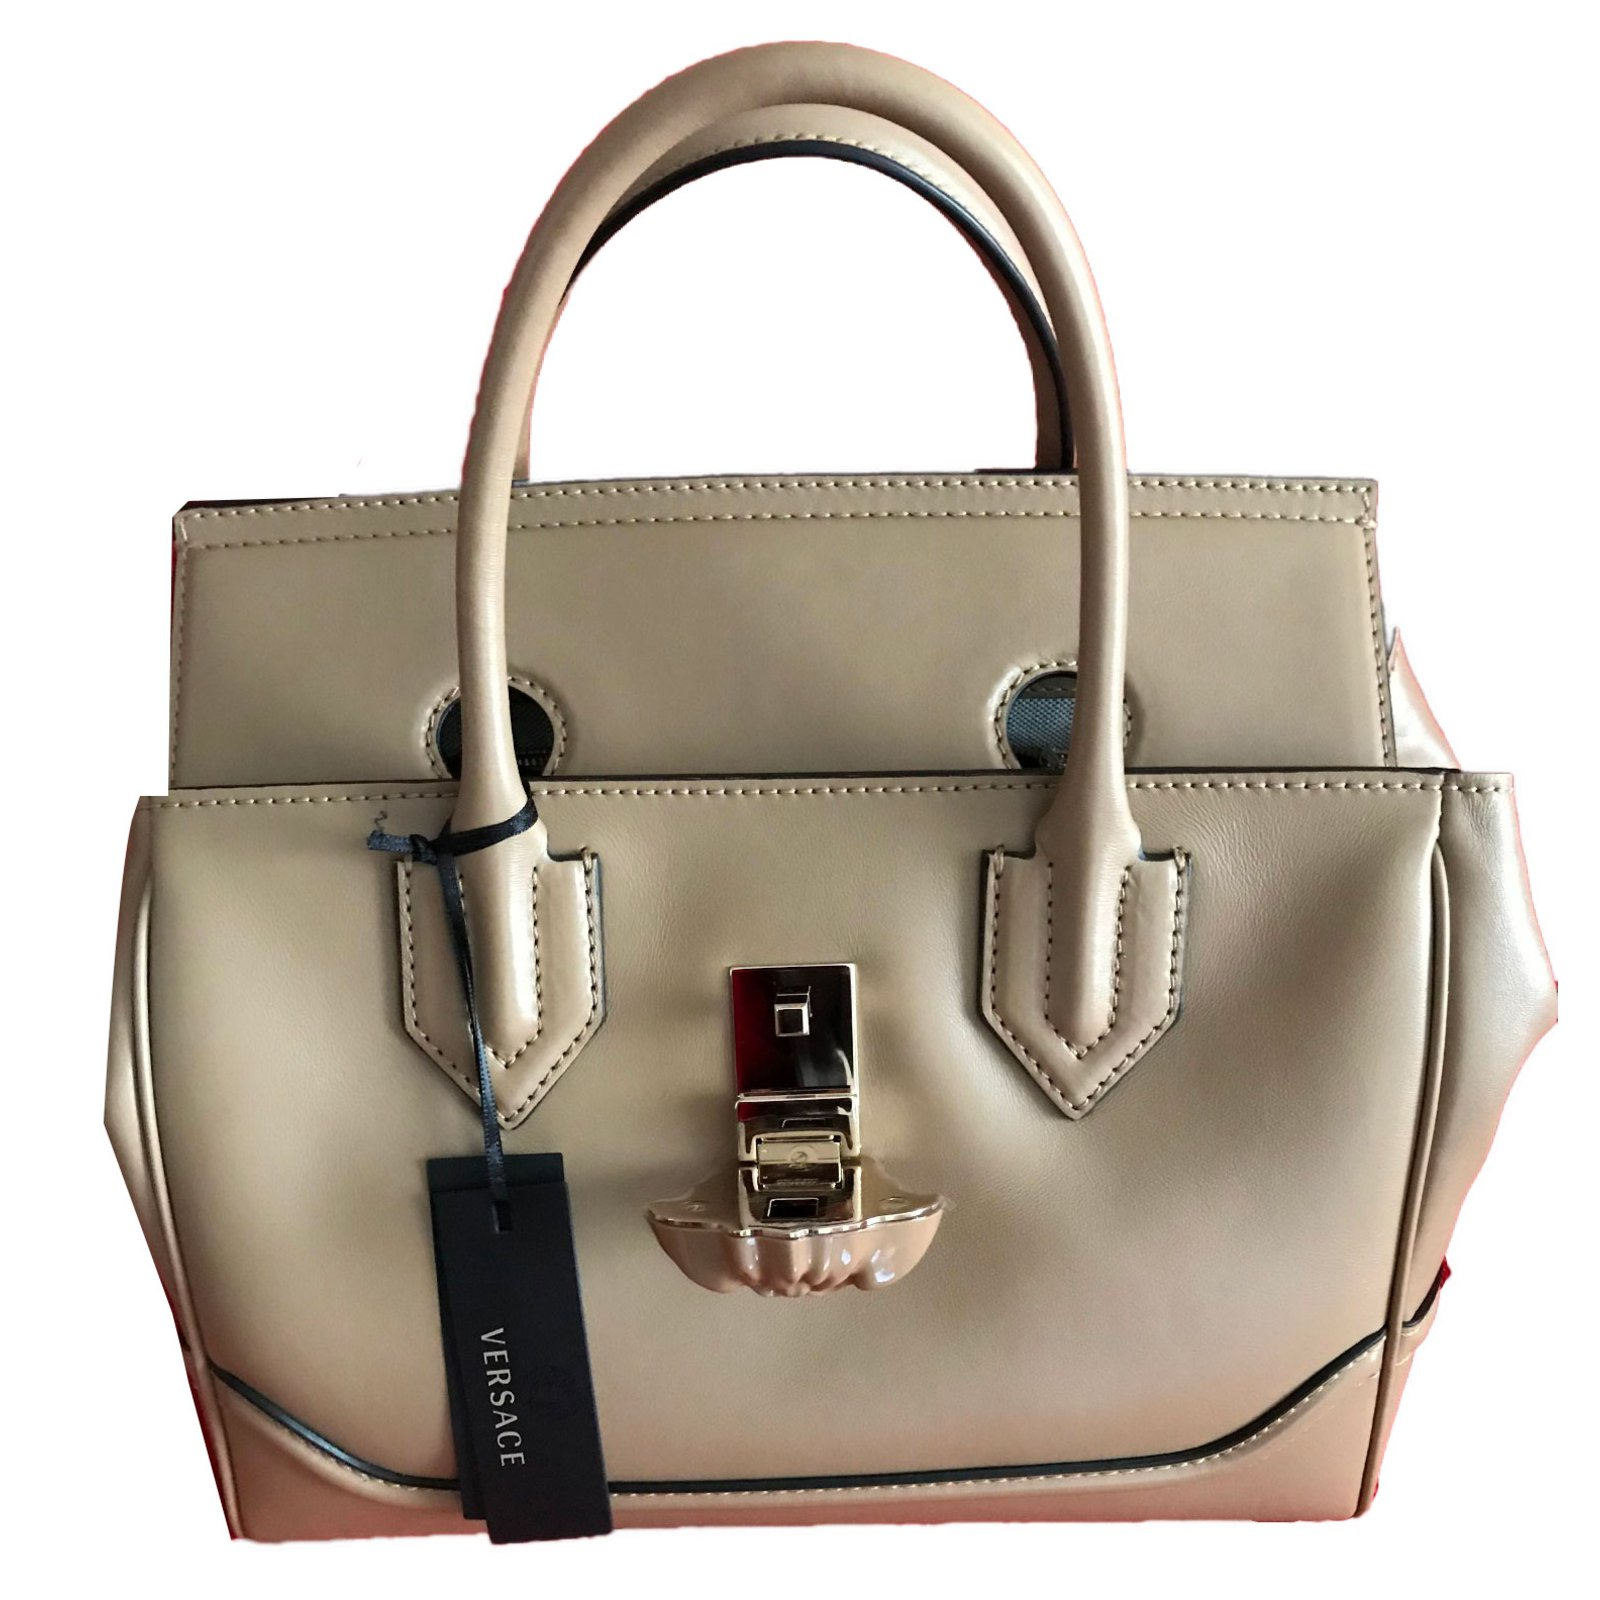 23dd47615e1c Gianni Versace VERSACE palazzo empire large - BEIGE Handbags Leather Beige  ref.57953